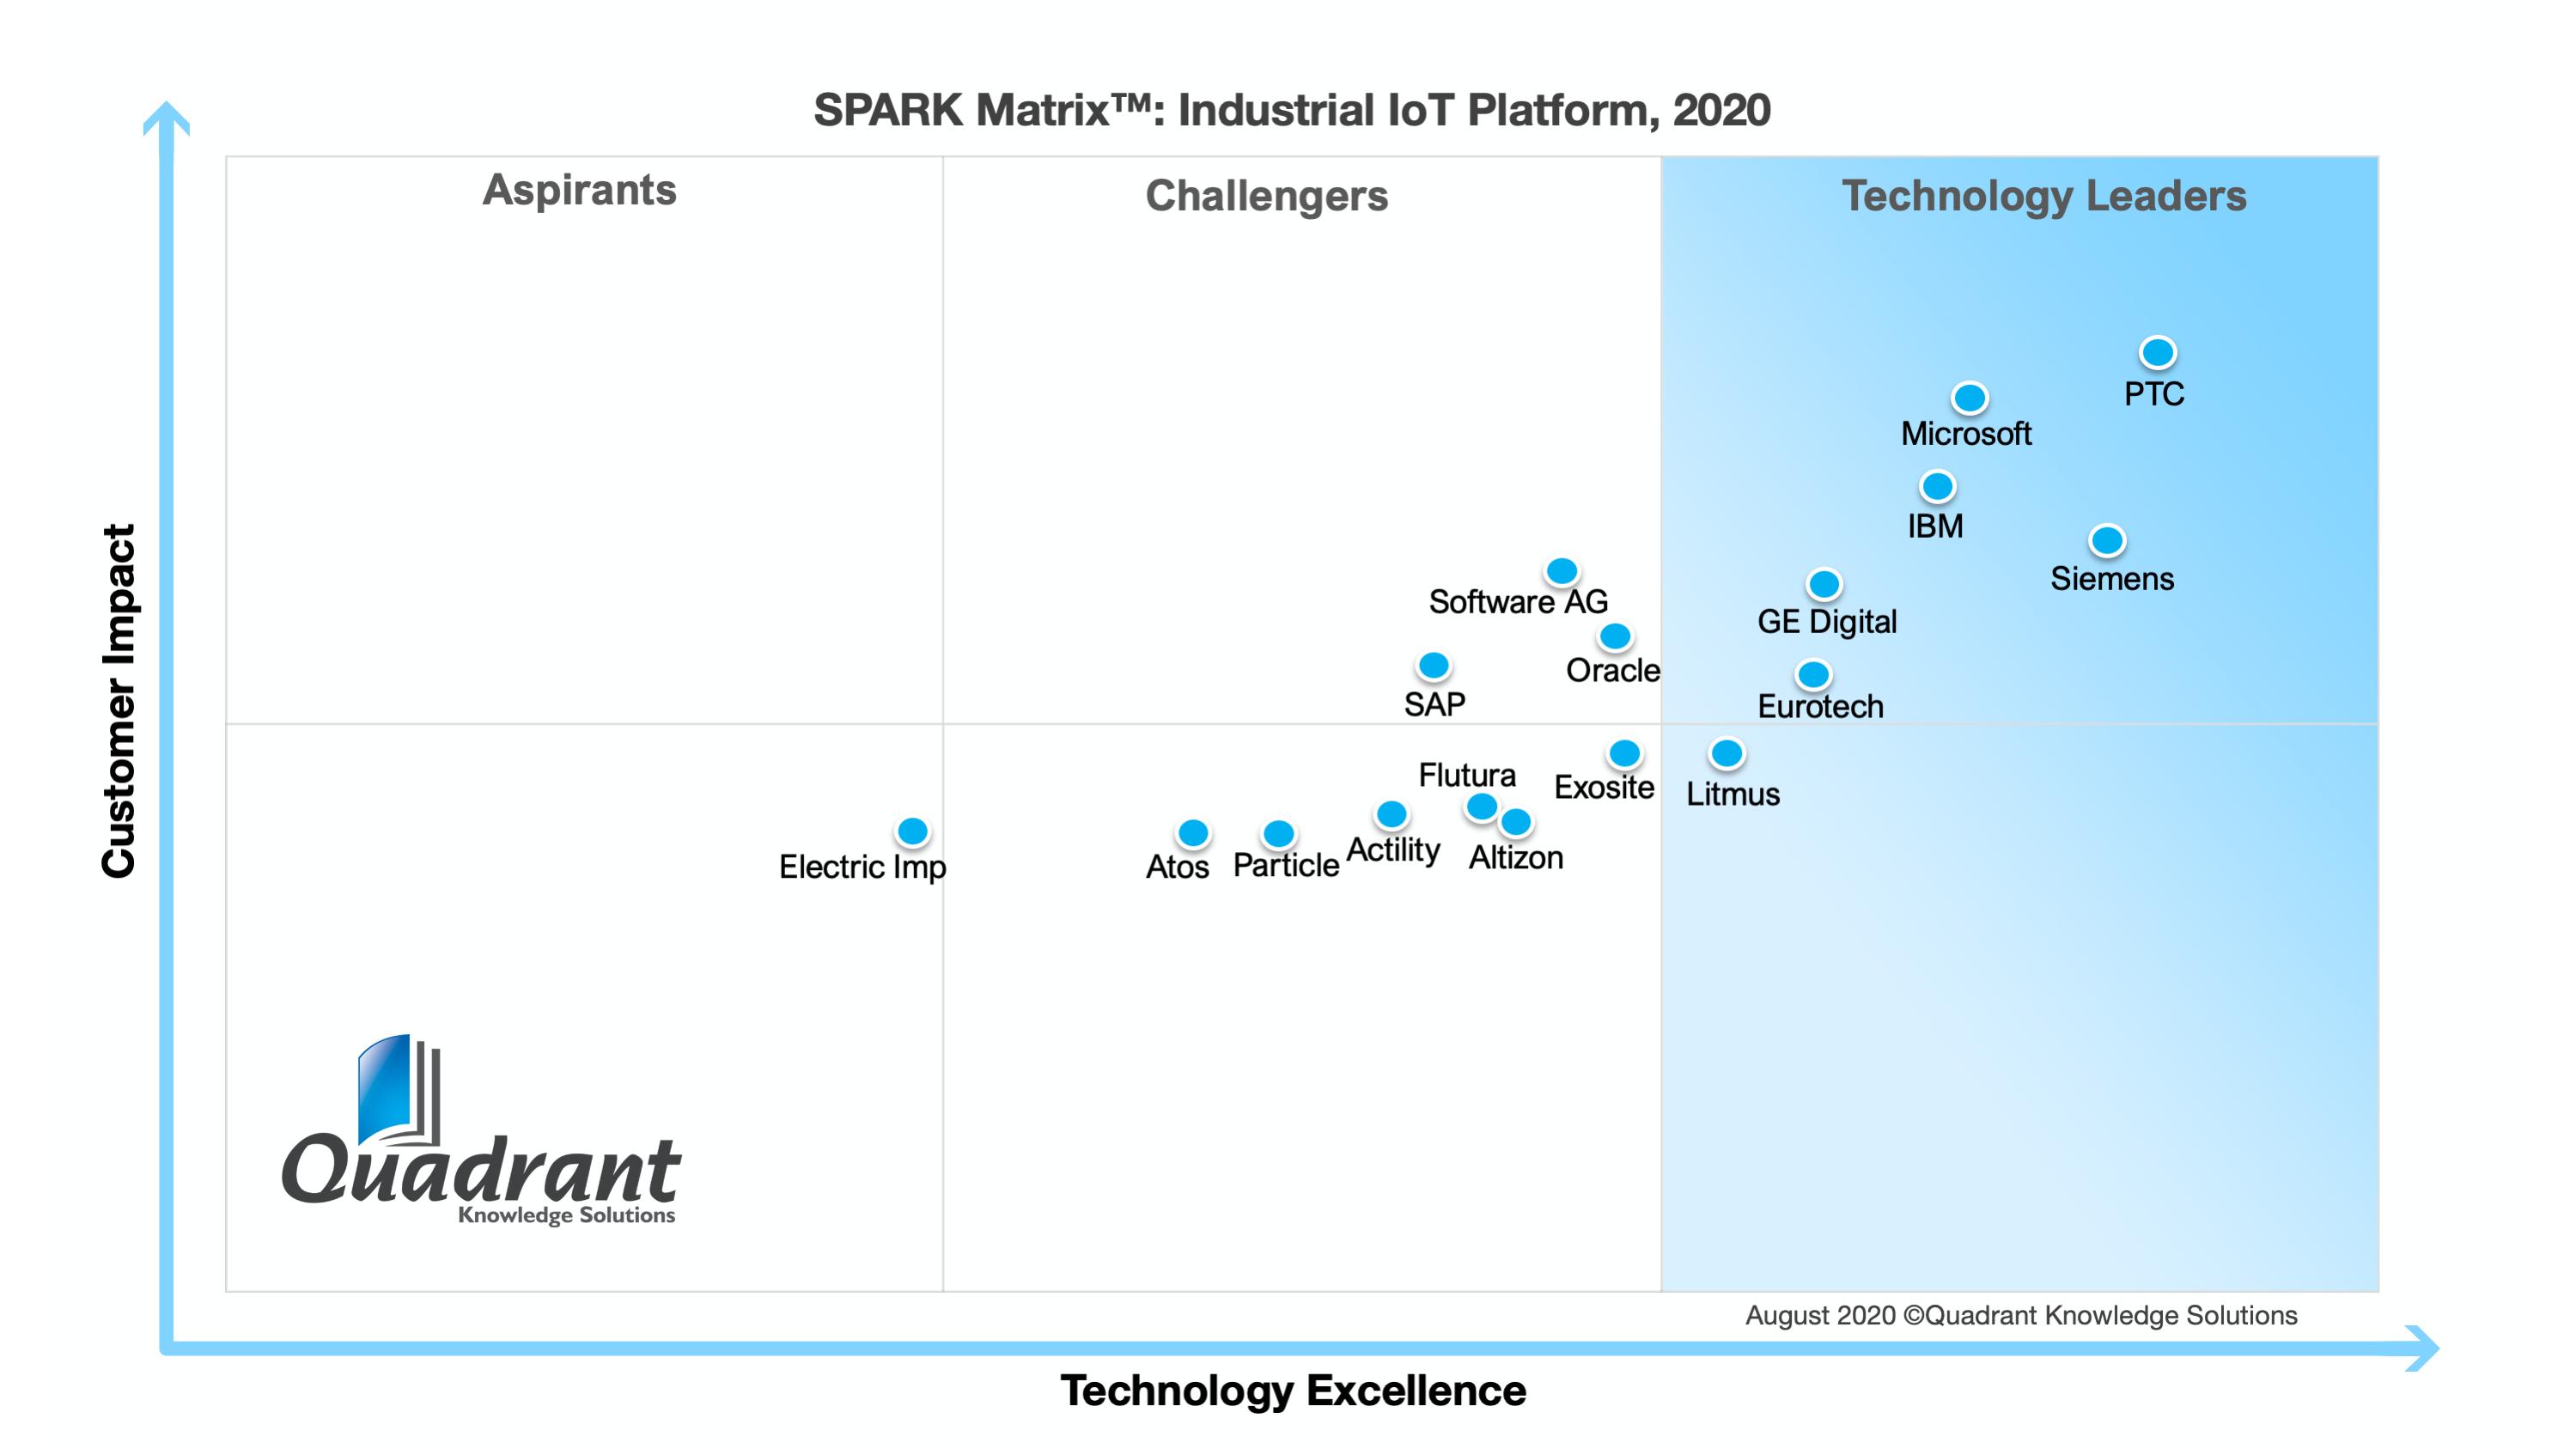 2020 SPARK Matrix of Industrial IoT Platforms